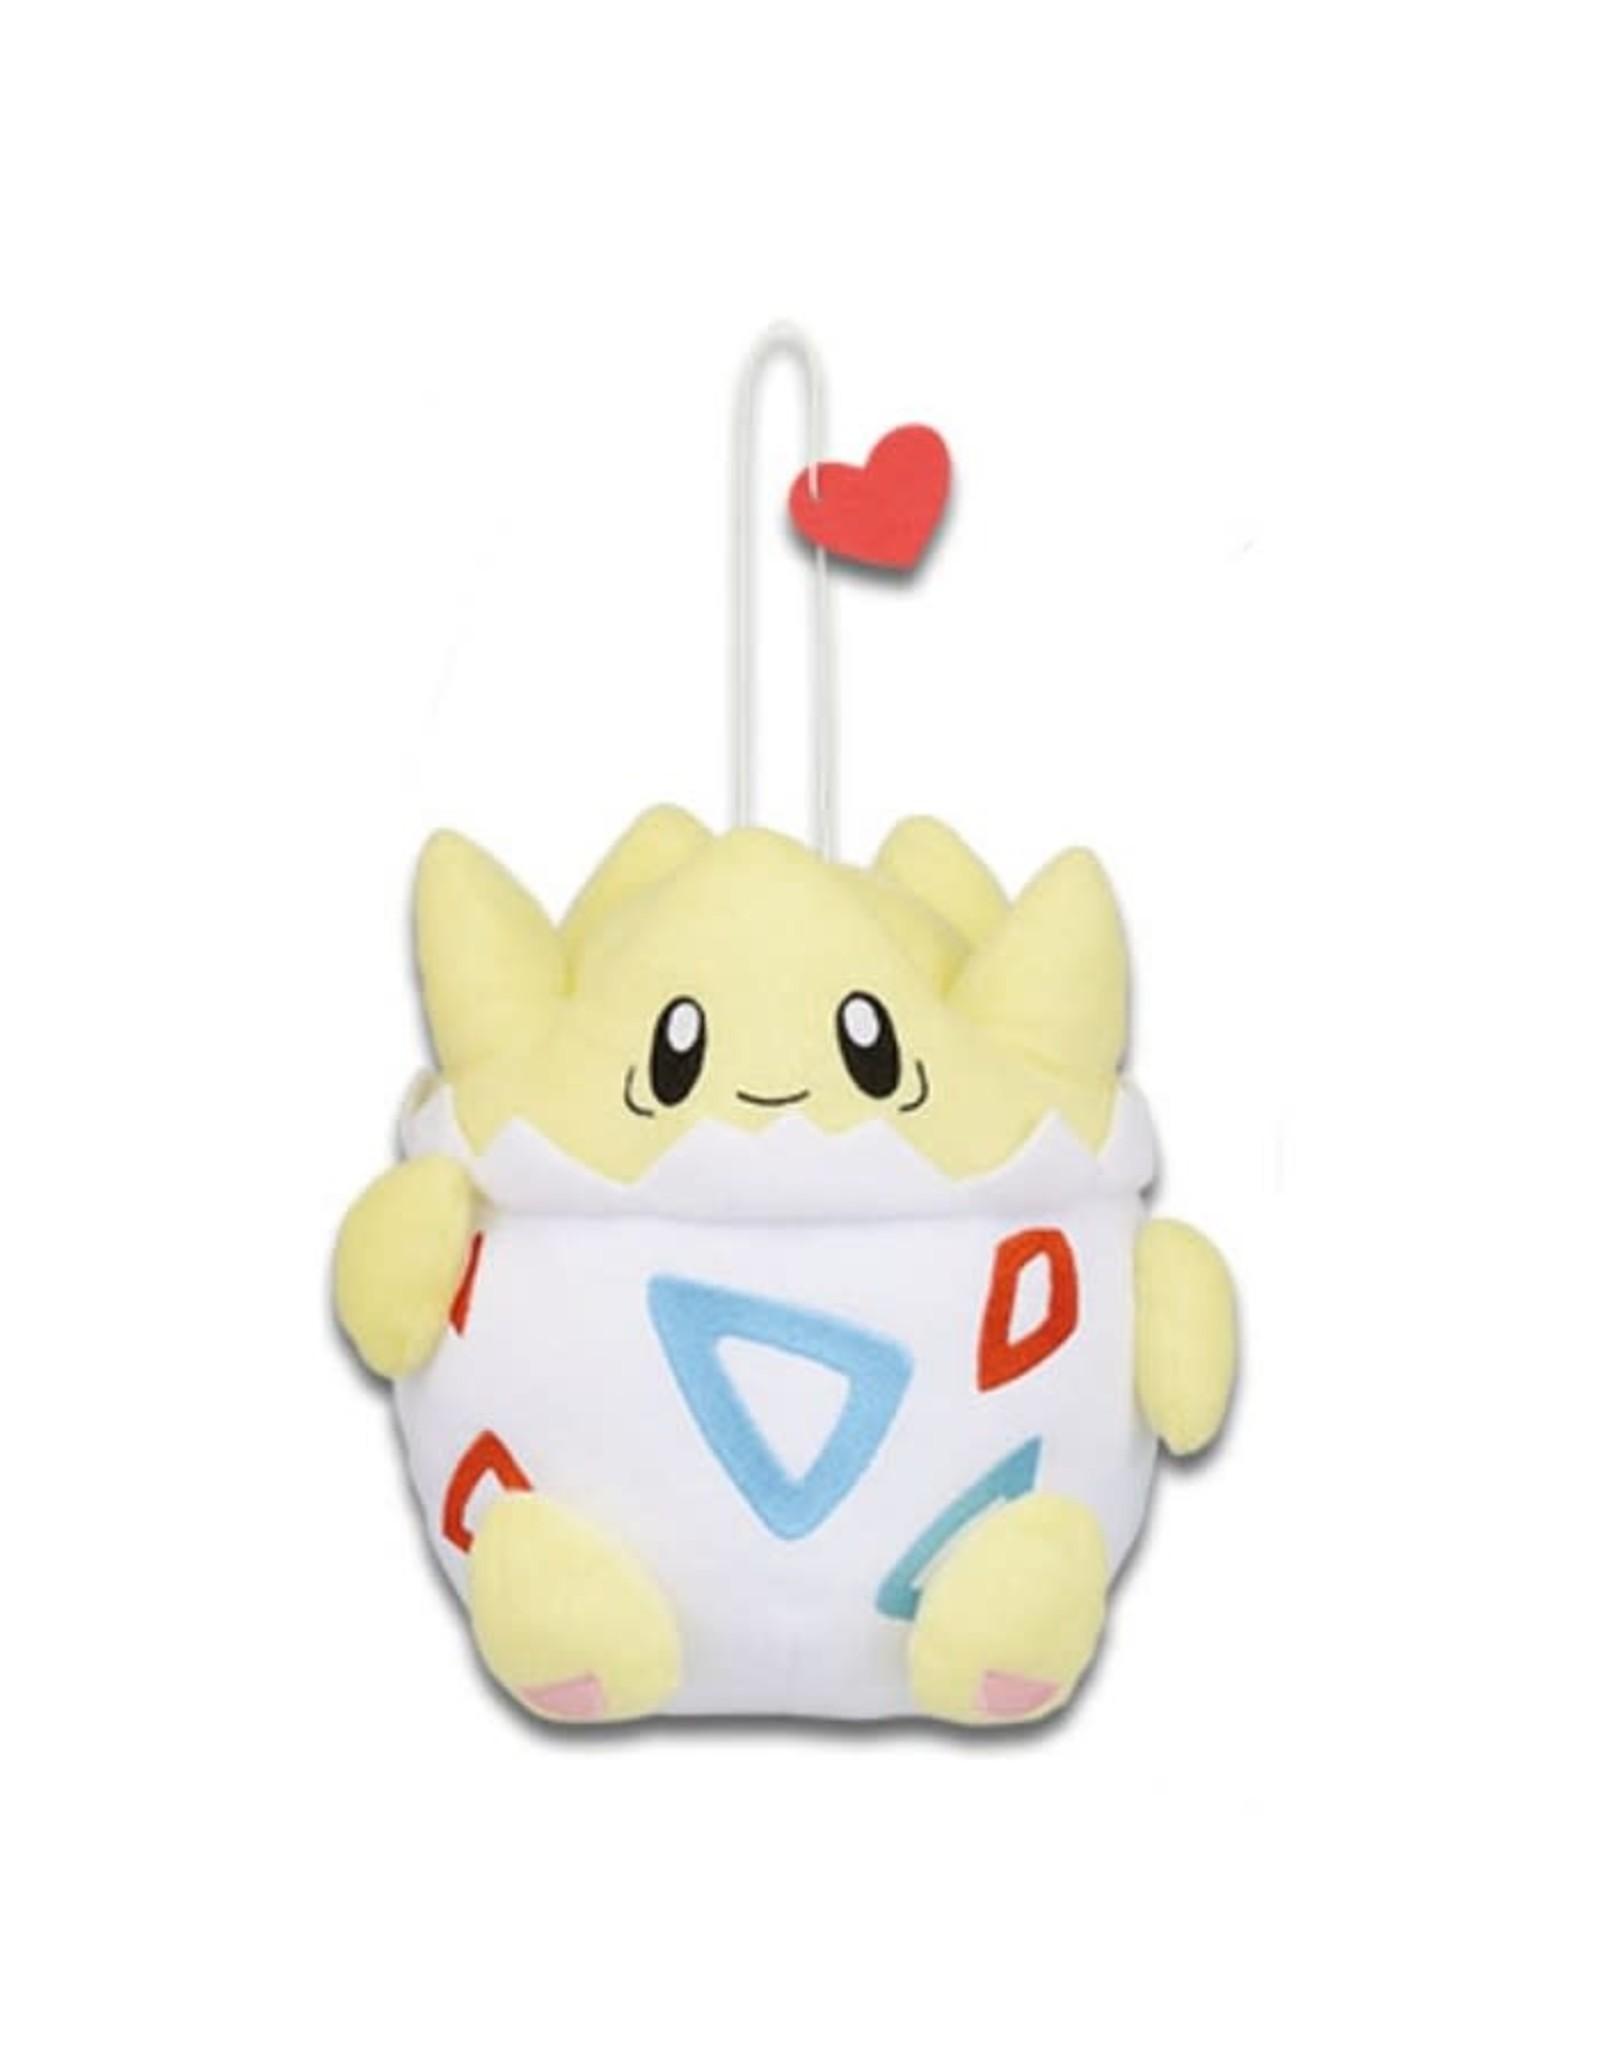 Pokémon Big Korotto Round Plush - Togepi - 21 cm